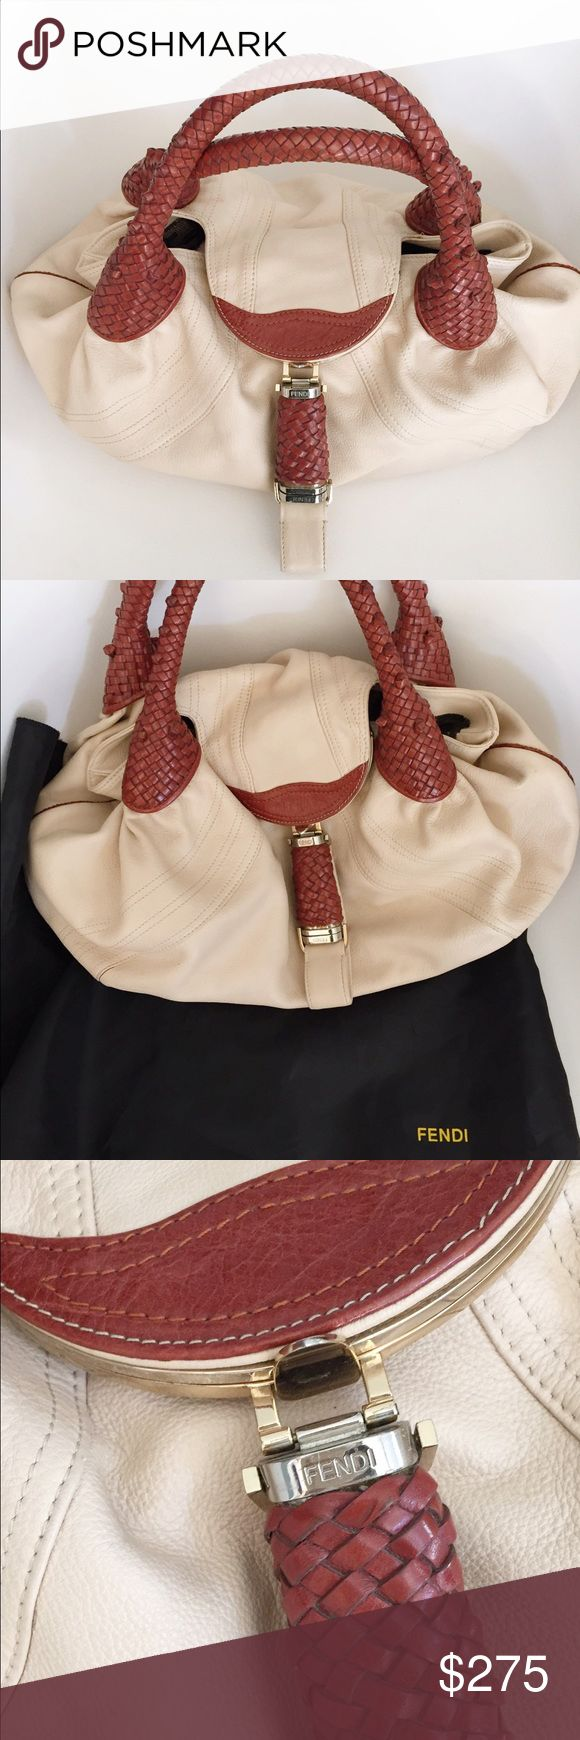 Fendi Spy Bag Beautiful cream colored fendi spy bag with cognac colored leather handles and detail. Fendi Bags Shoulder Bags